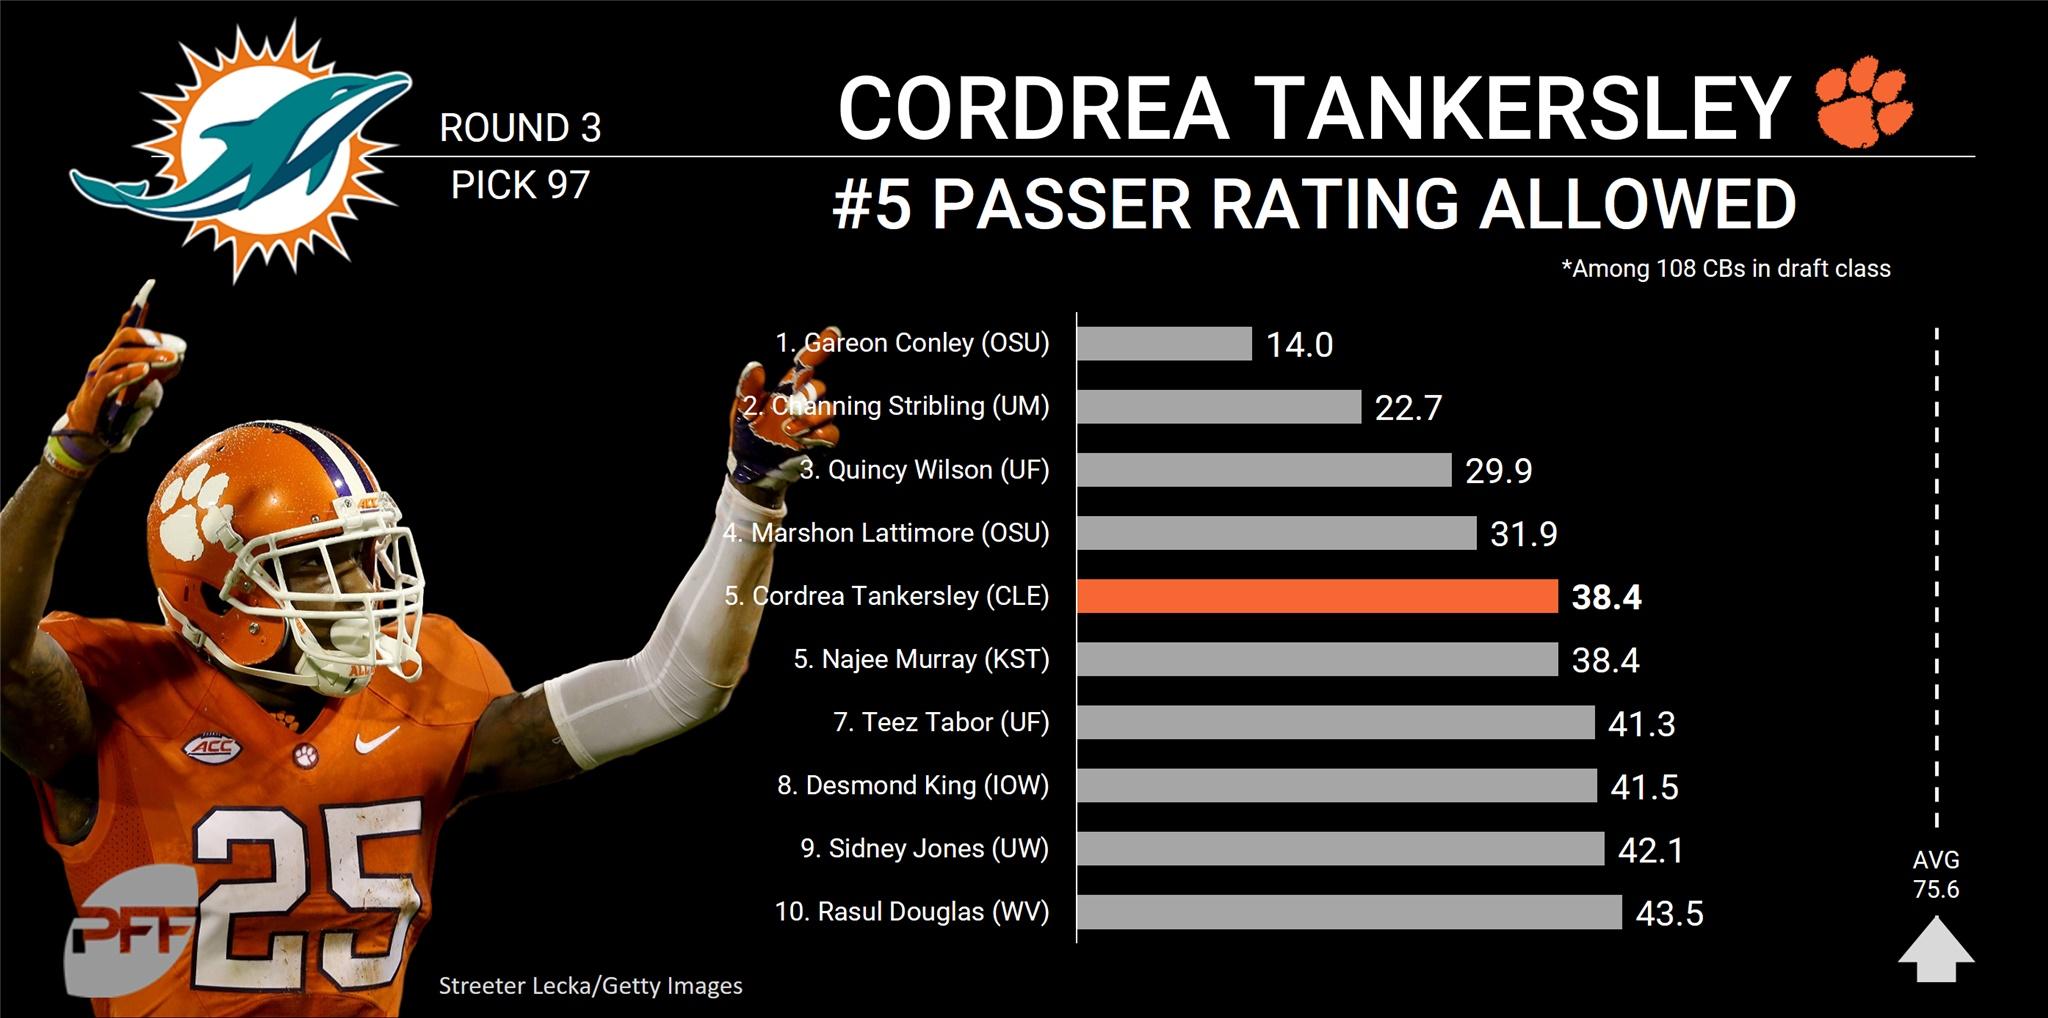 Cordrea Tankersley